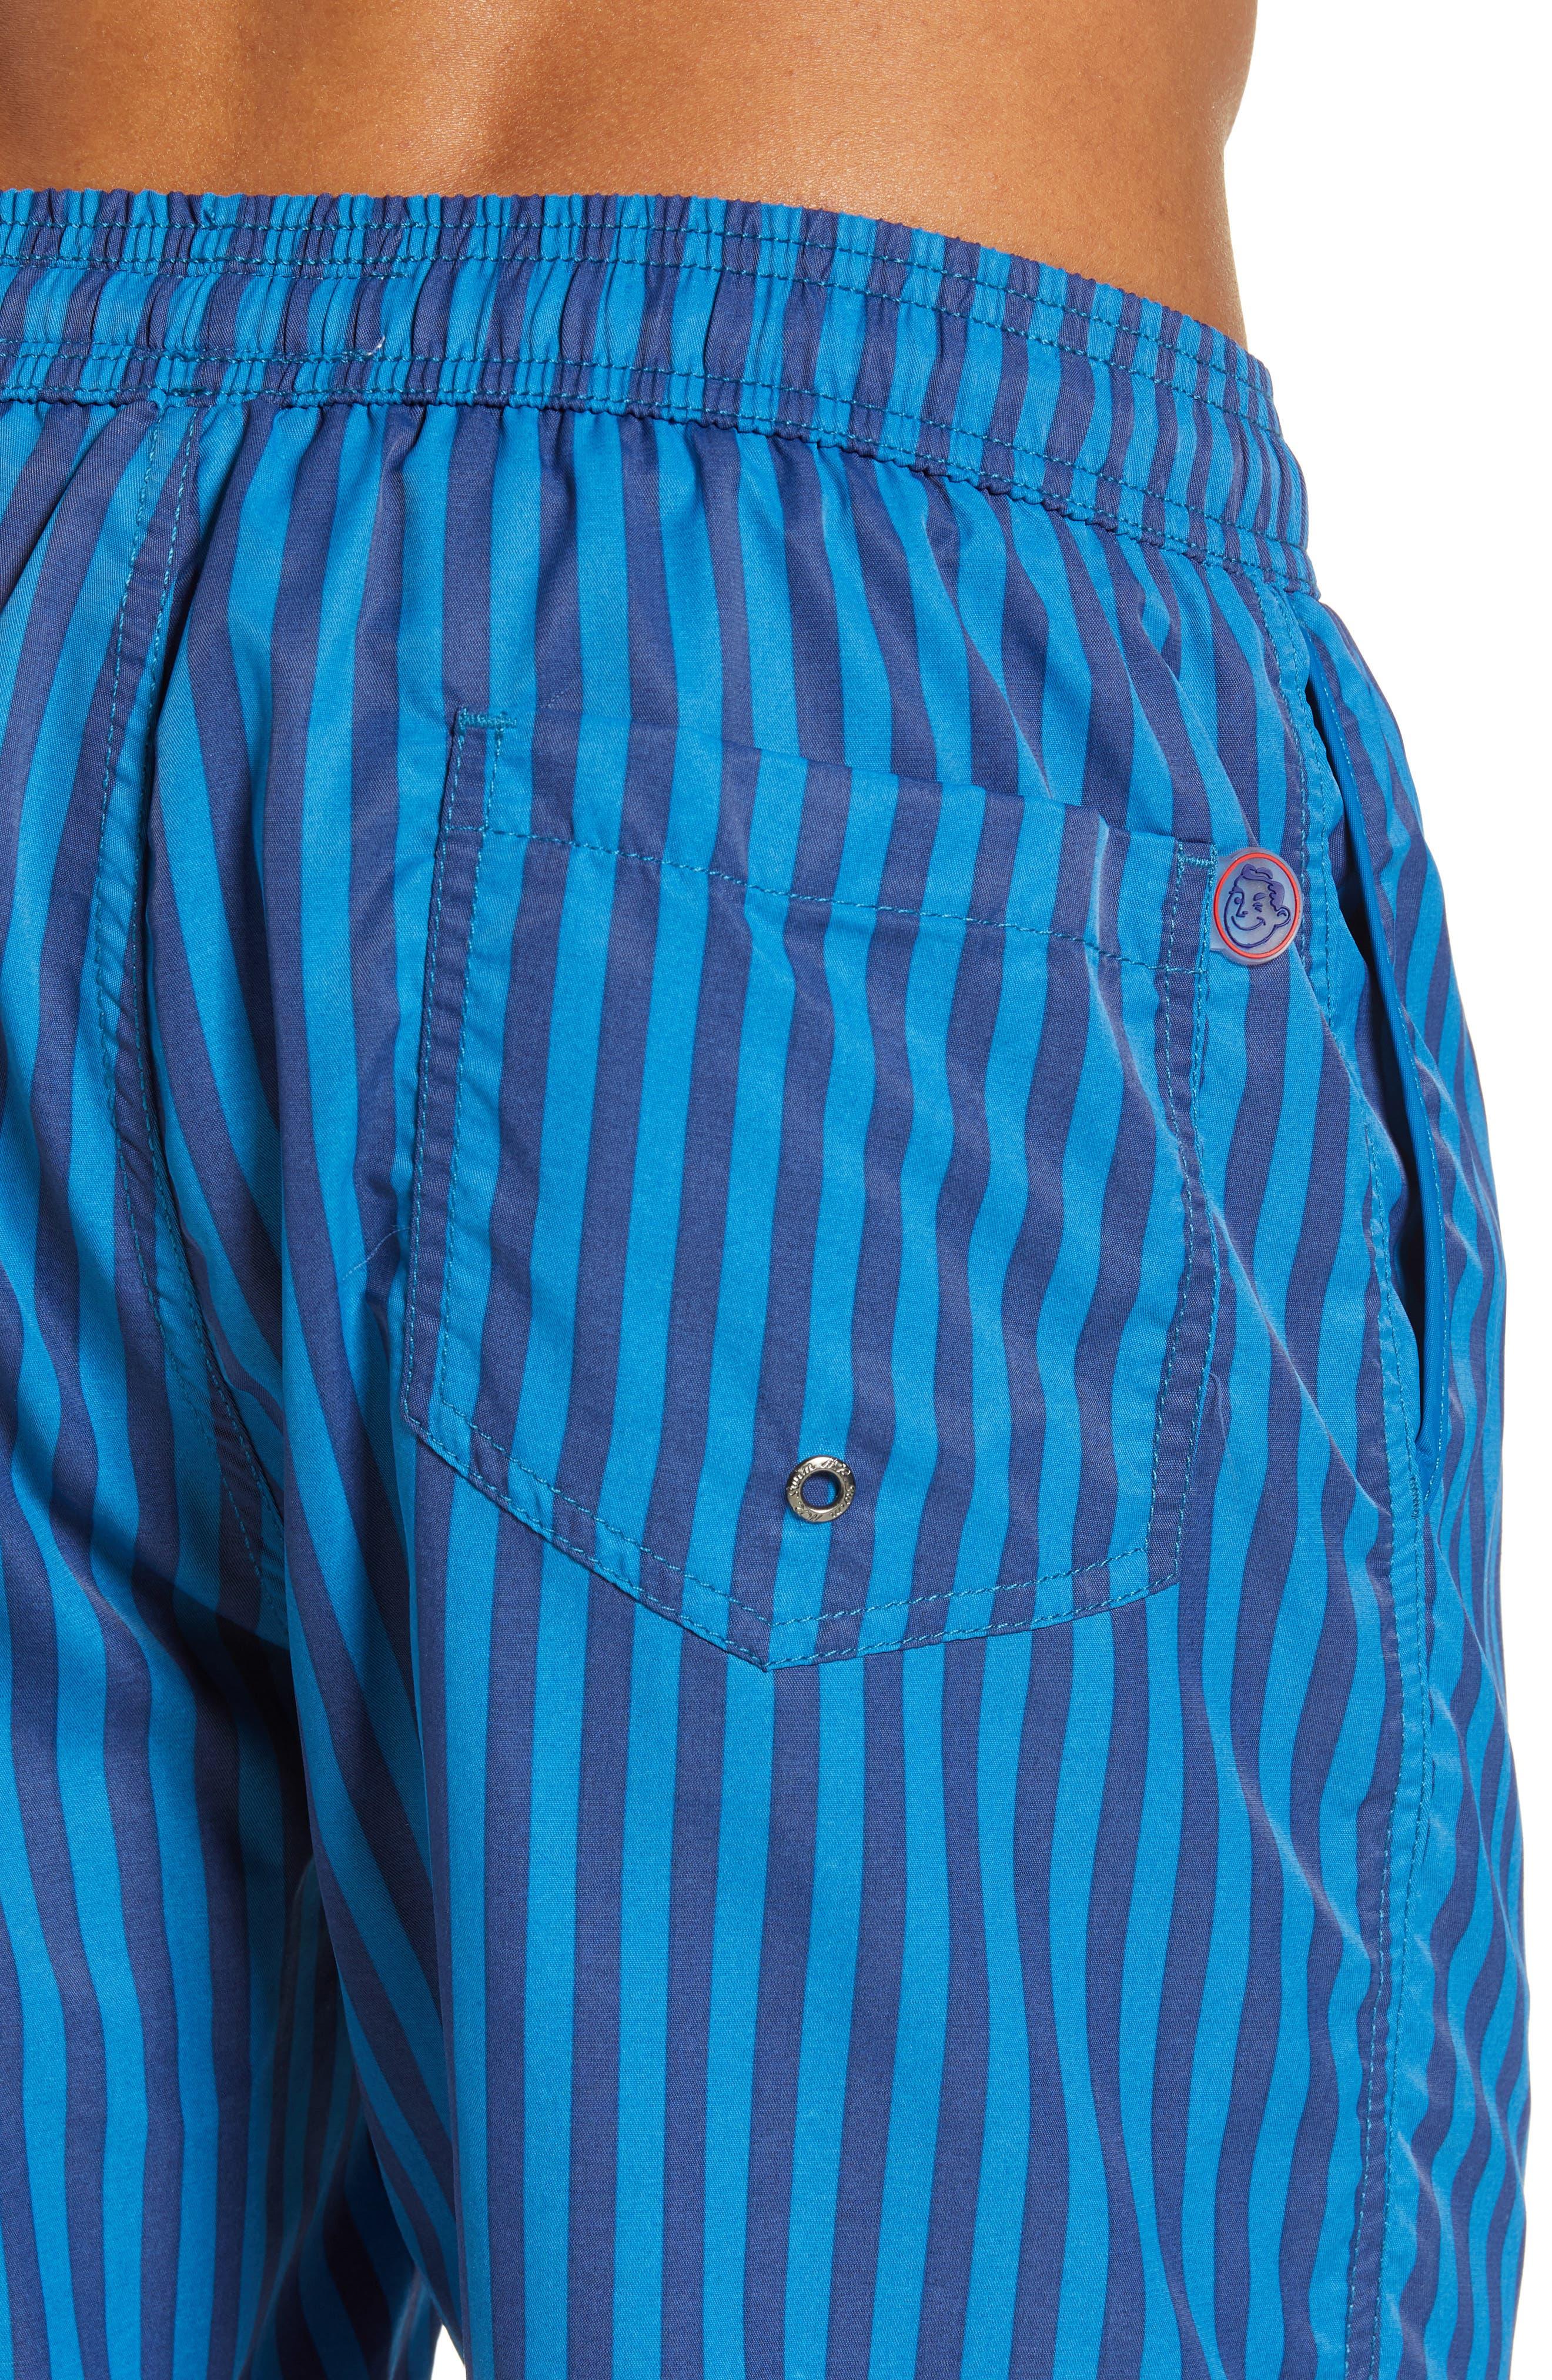 Mr. Swim Cabana Stripe Swim Trunks,                             Alternate thumbnail 4, color,                             NAVY/ ROYAL